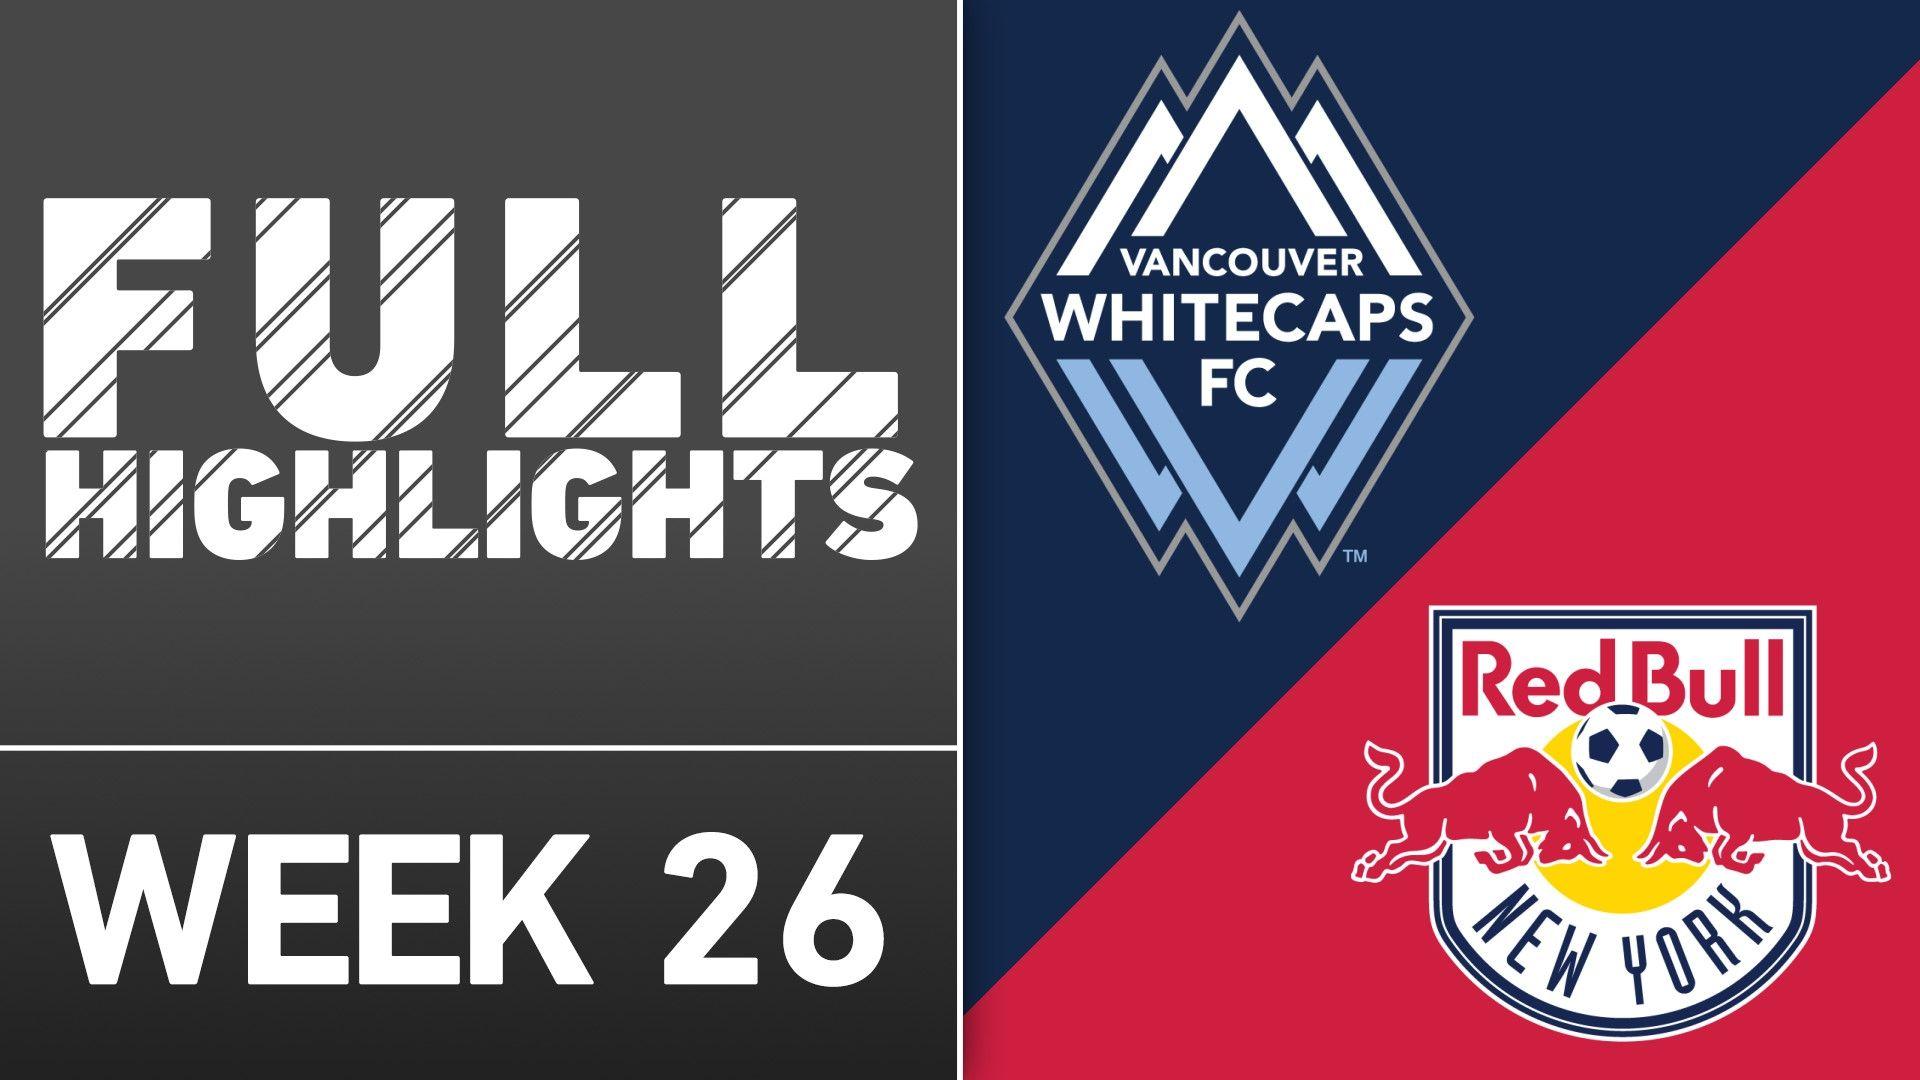 Video via MLS: Vancouver 0-1 NYRB